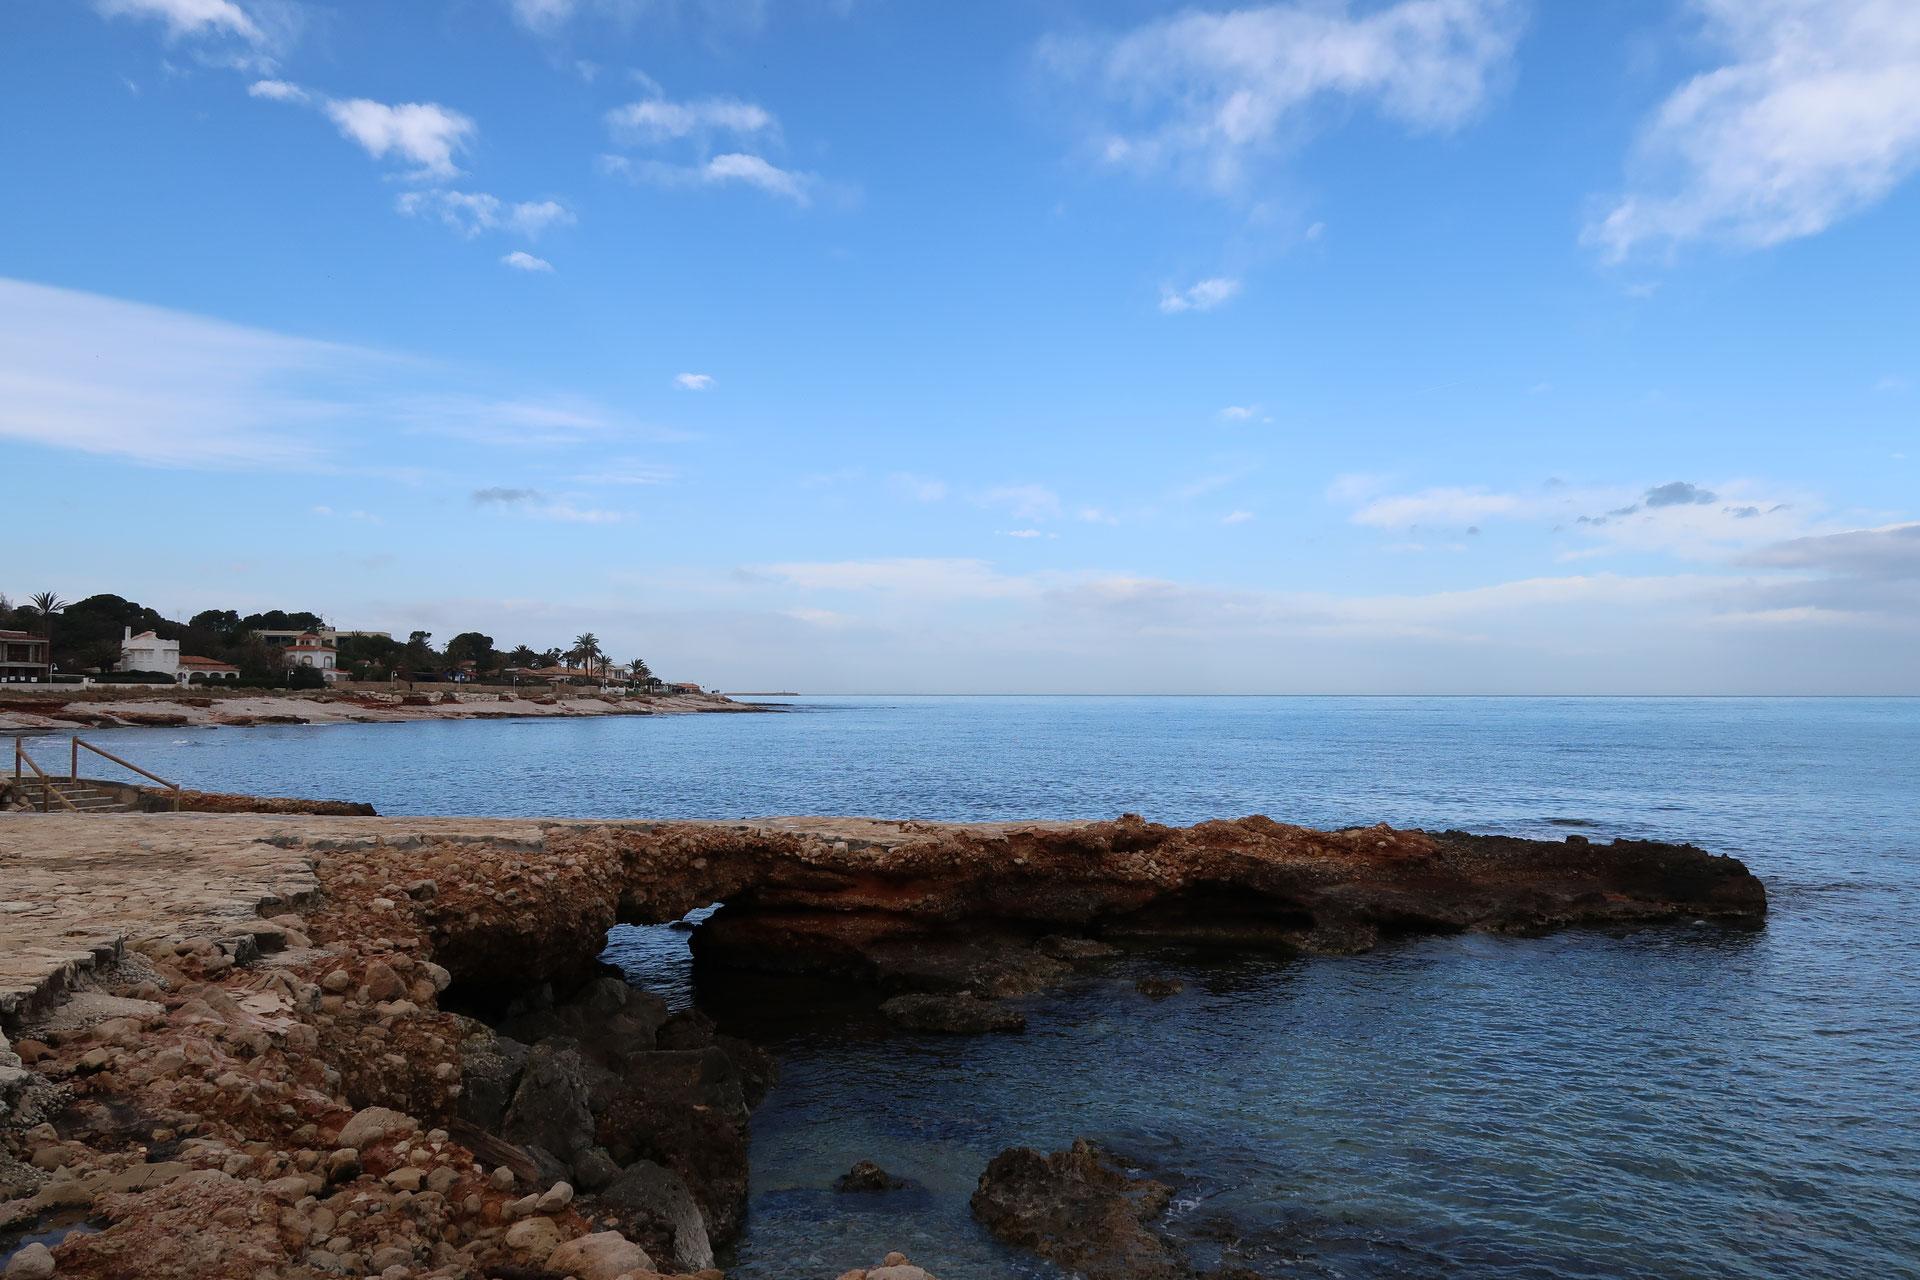 Costa blanca ferienwohnung valencia pool internet - Swimming pool repairs costa blanca ...